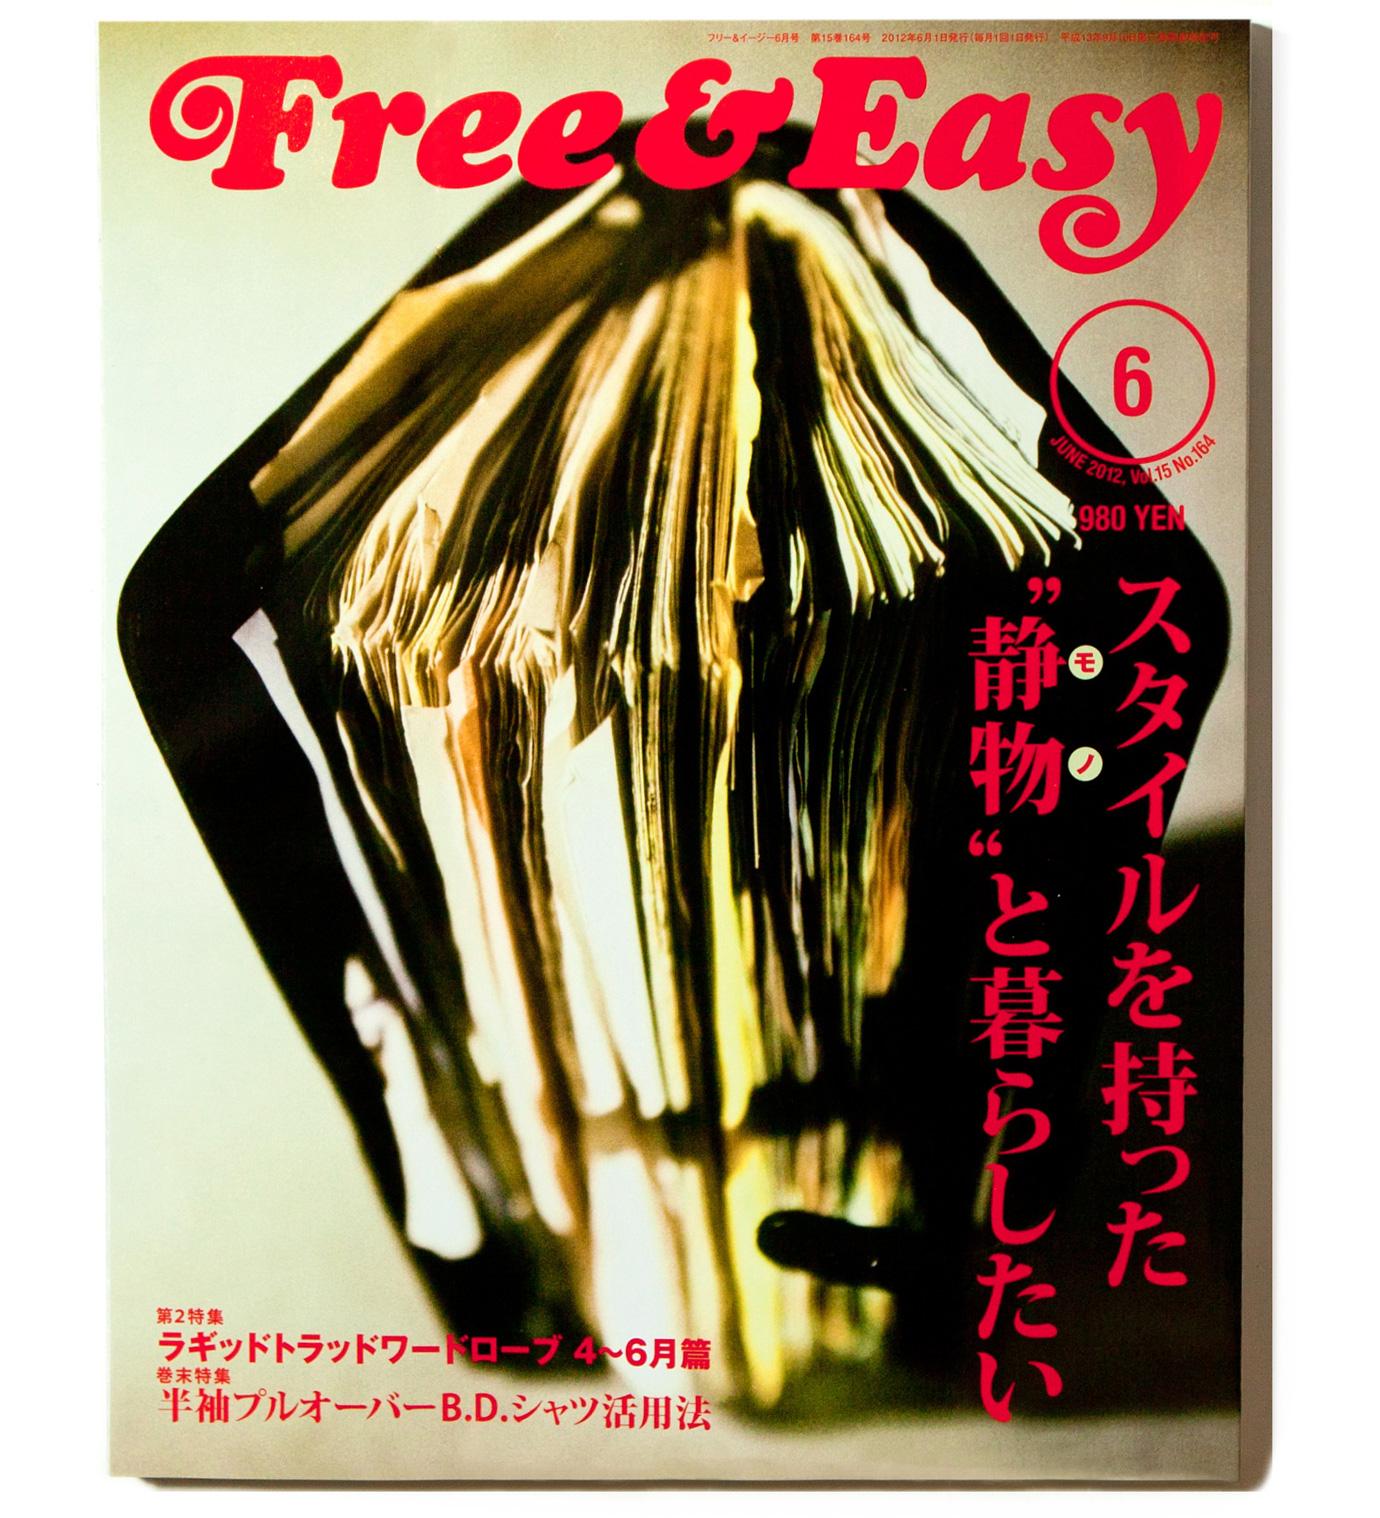 Free&Easy Vol. 15 No. 164